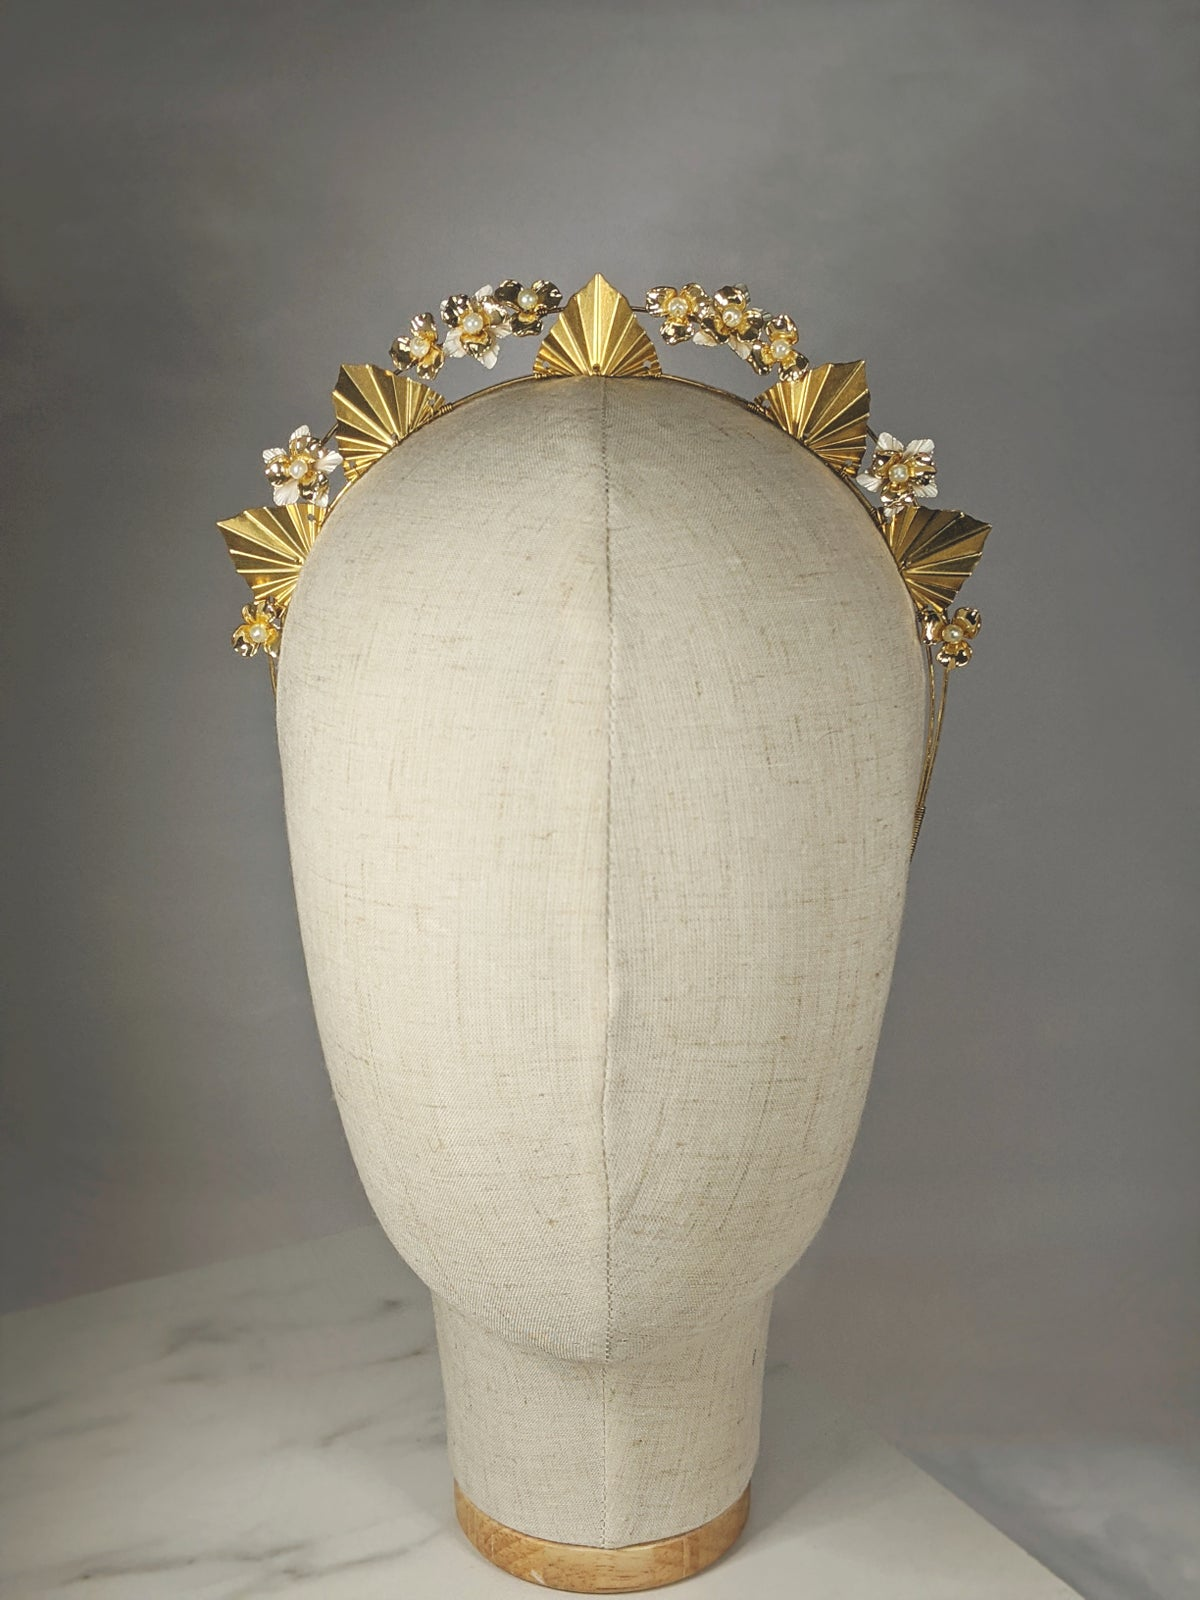 Athena petite halo headband